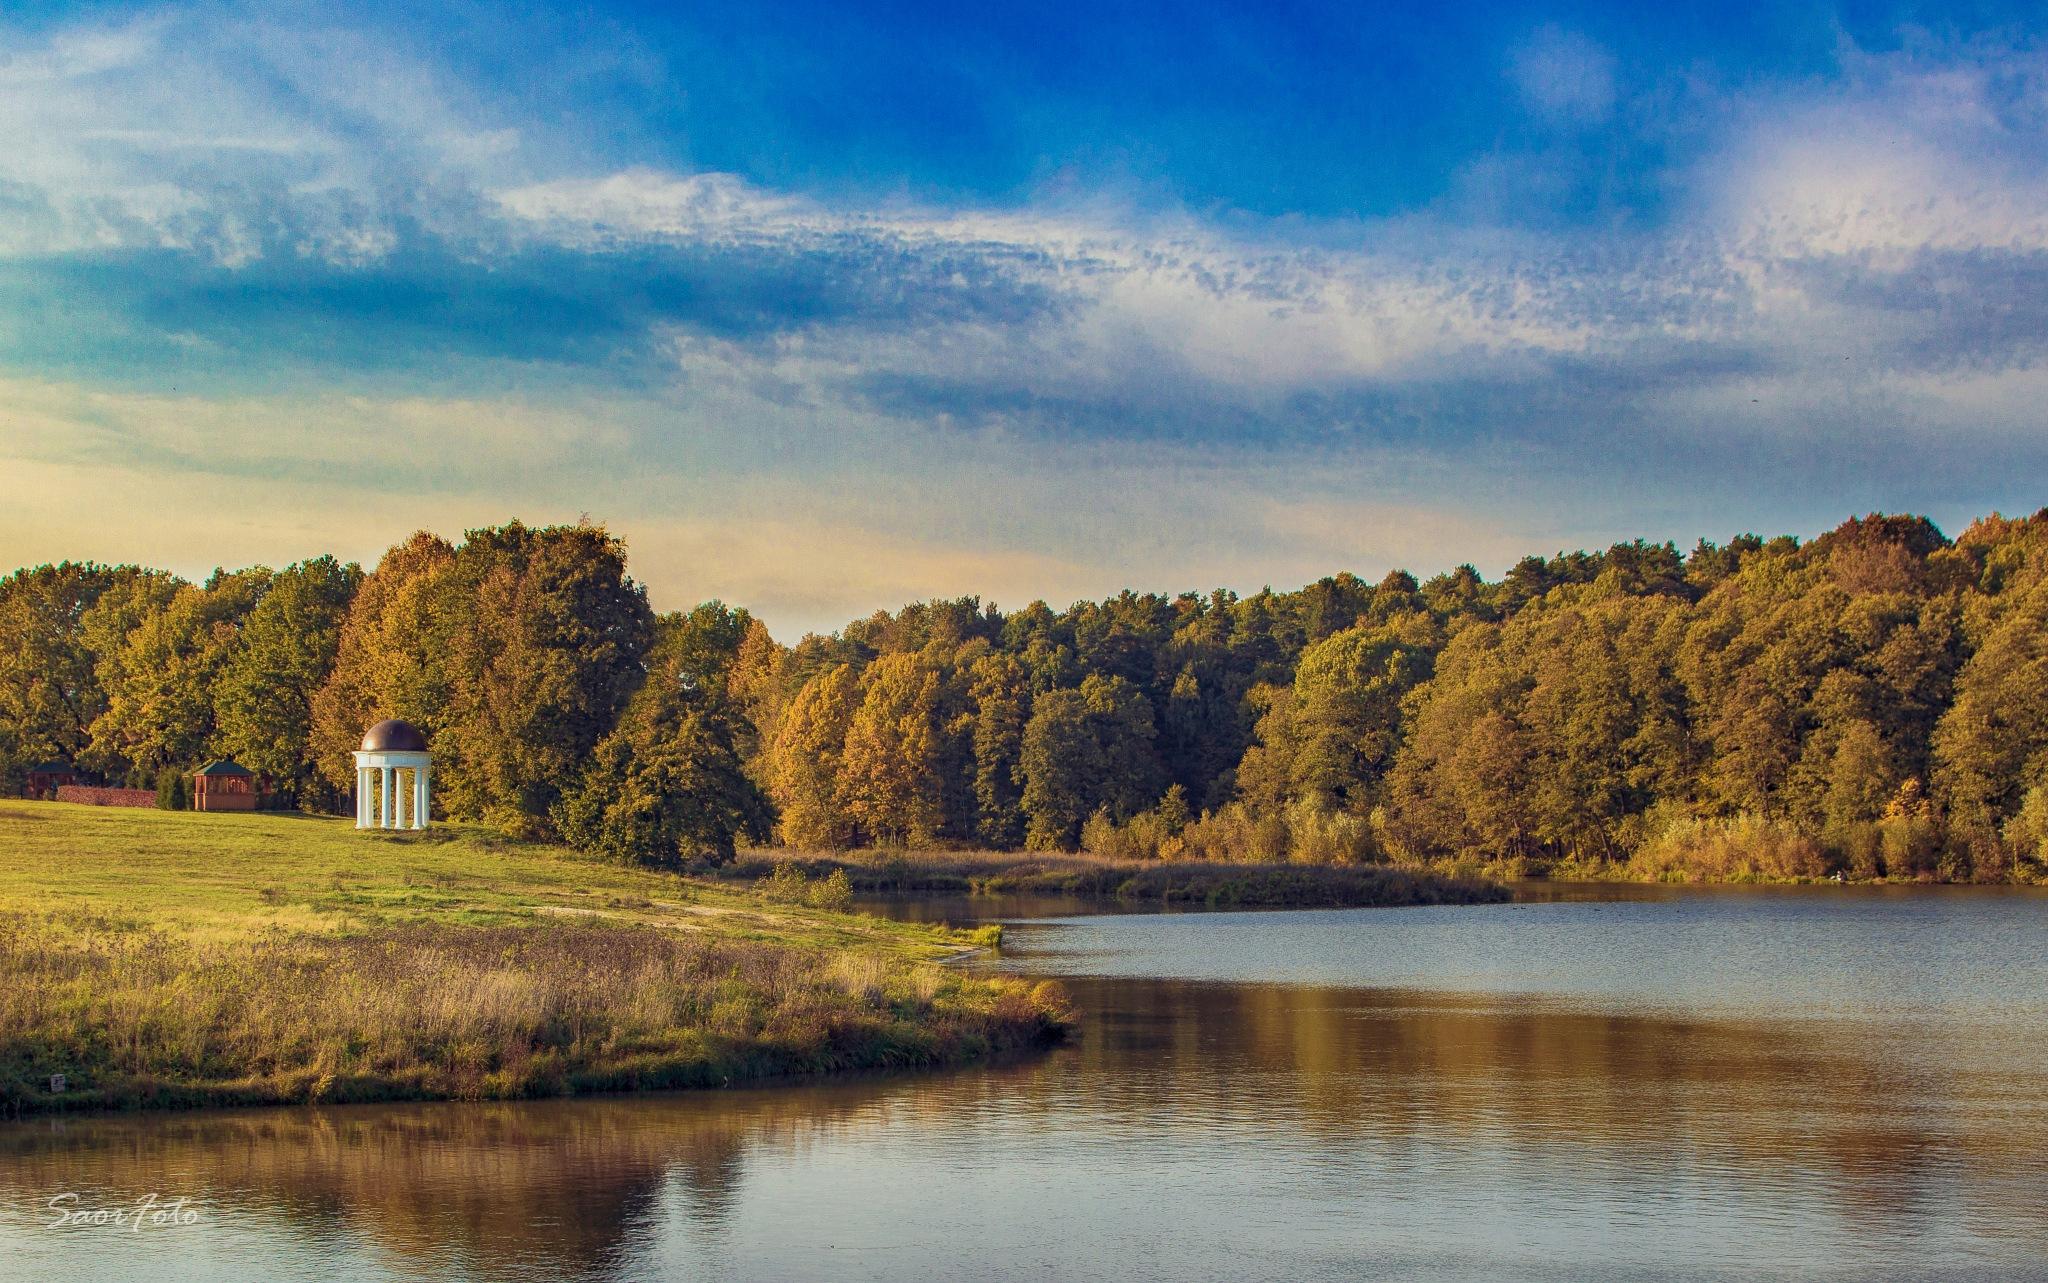 autumn  by saorfoto70